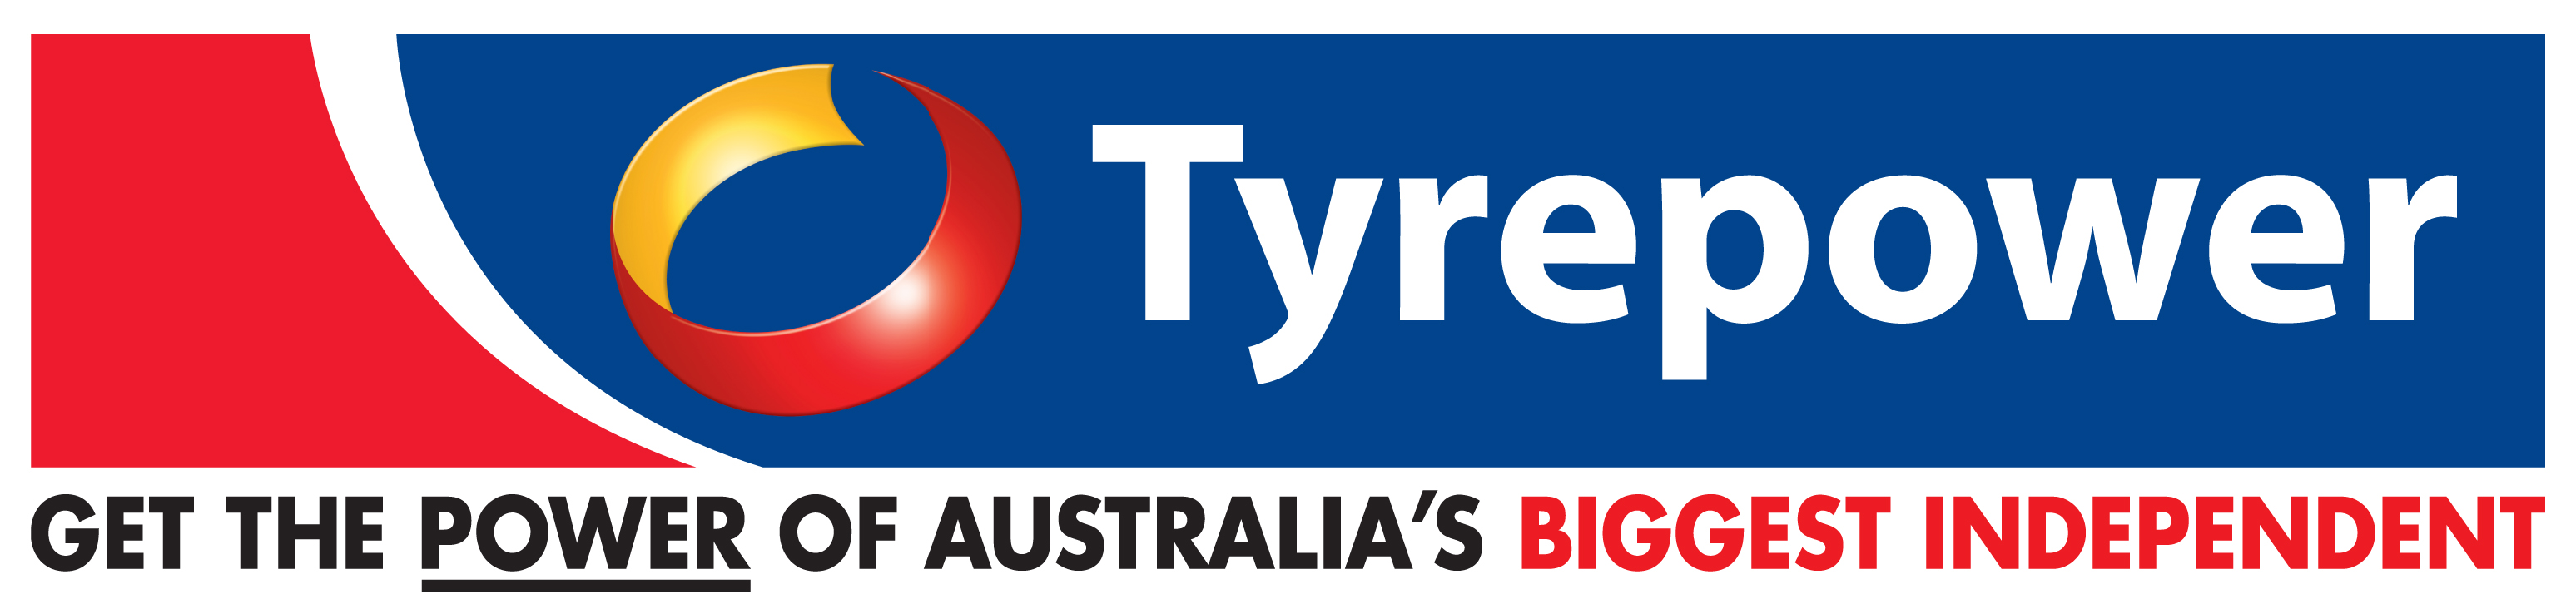 Tyrepower - Lavington, NSW 2641 - (02) 6025 3381 | ShowMeLocal.com